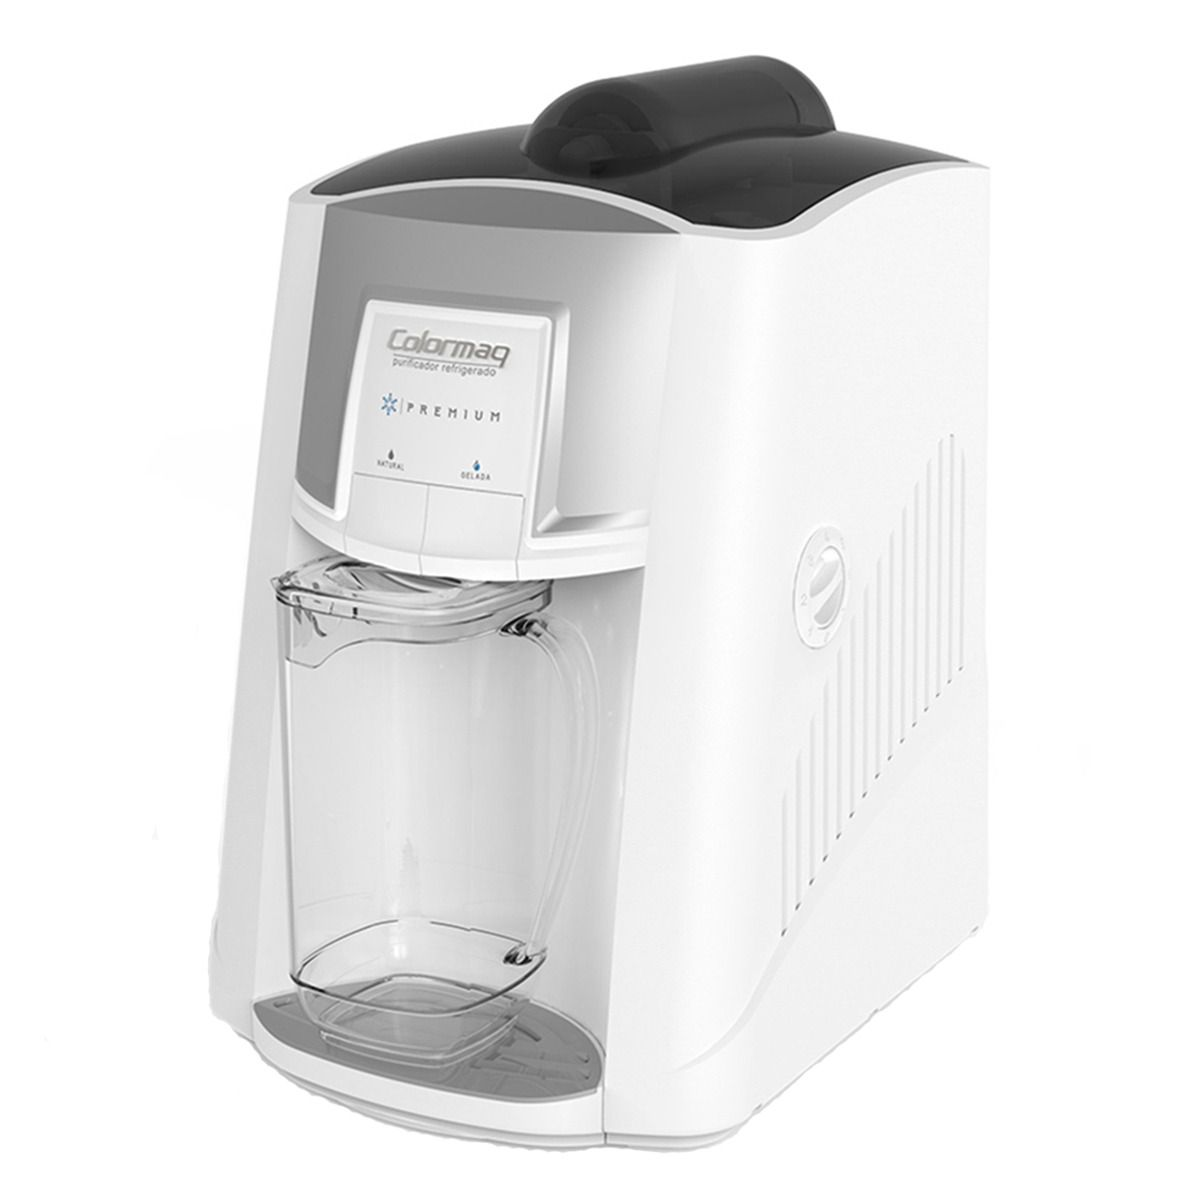 Purificador de Água Colormaq Premium- Branco - 220 V